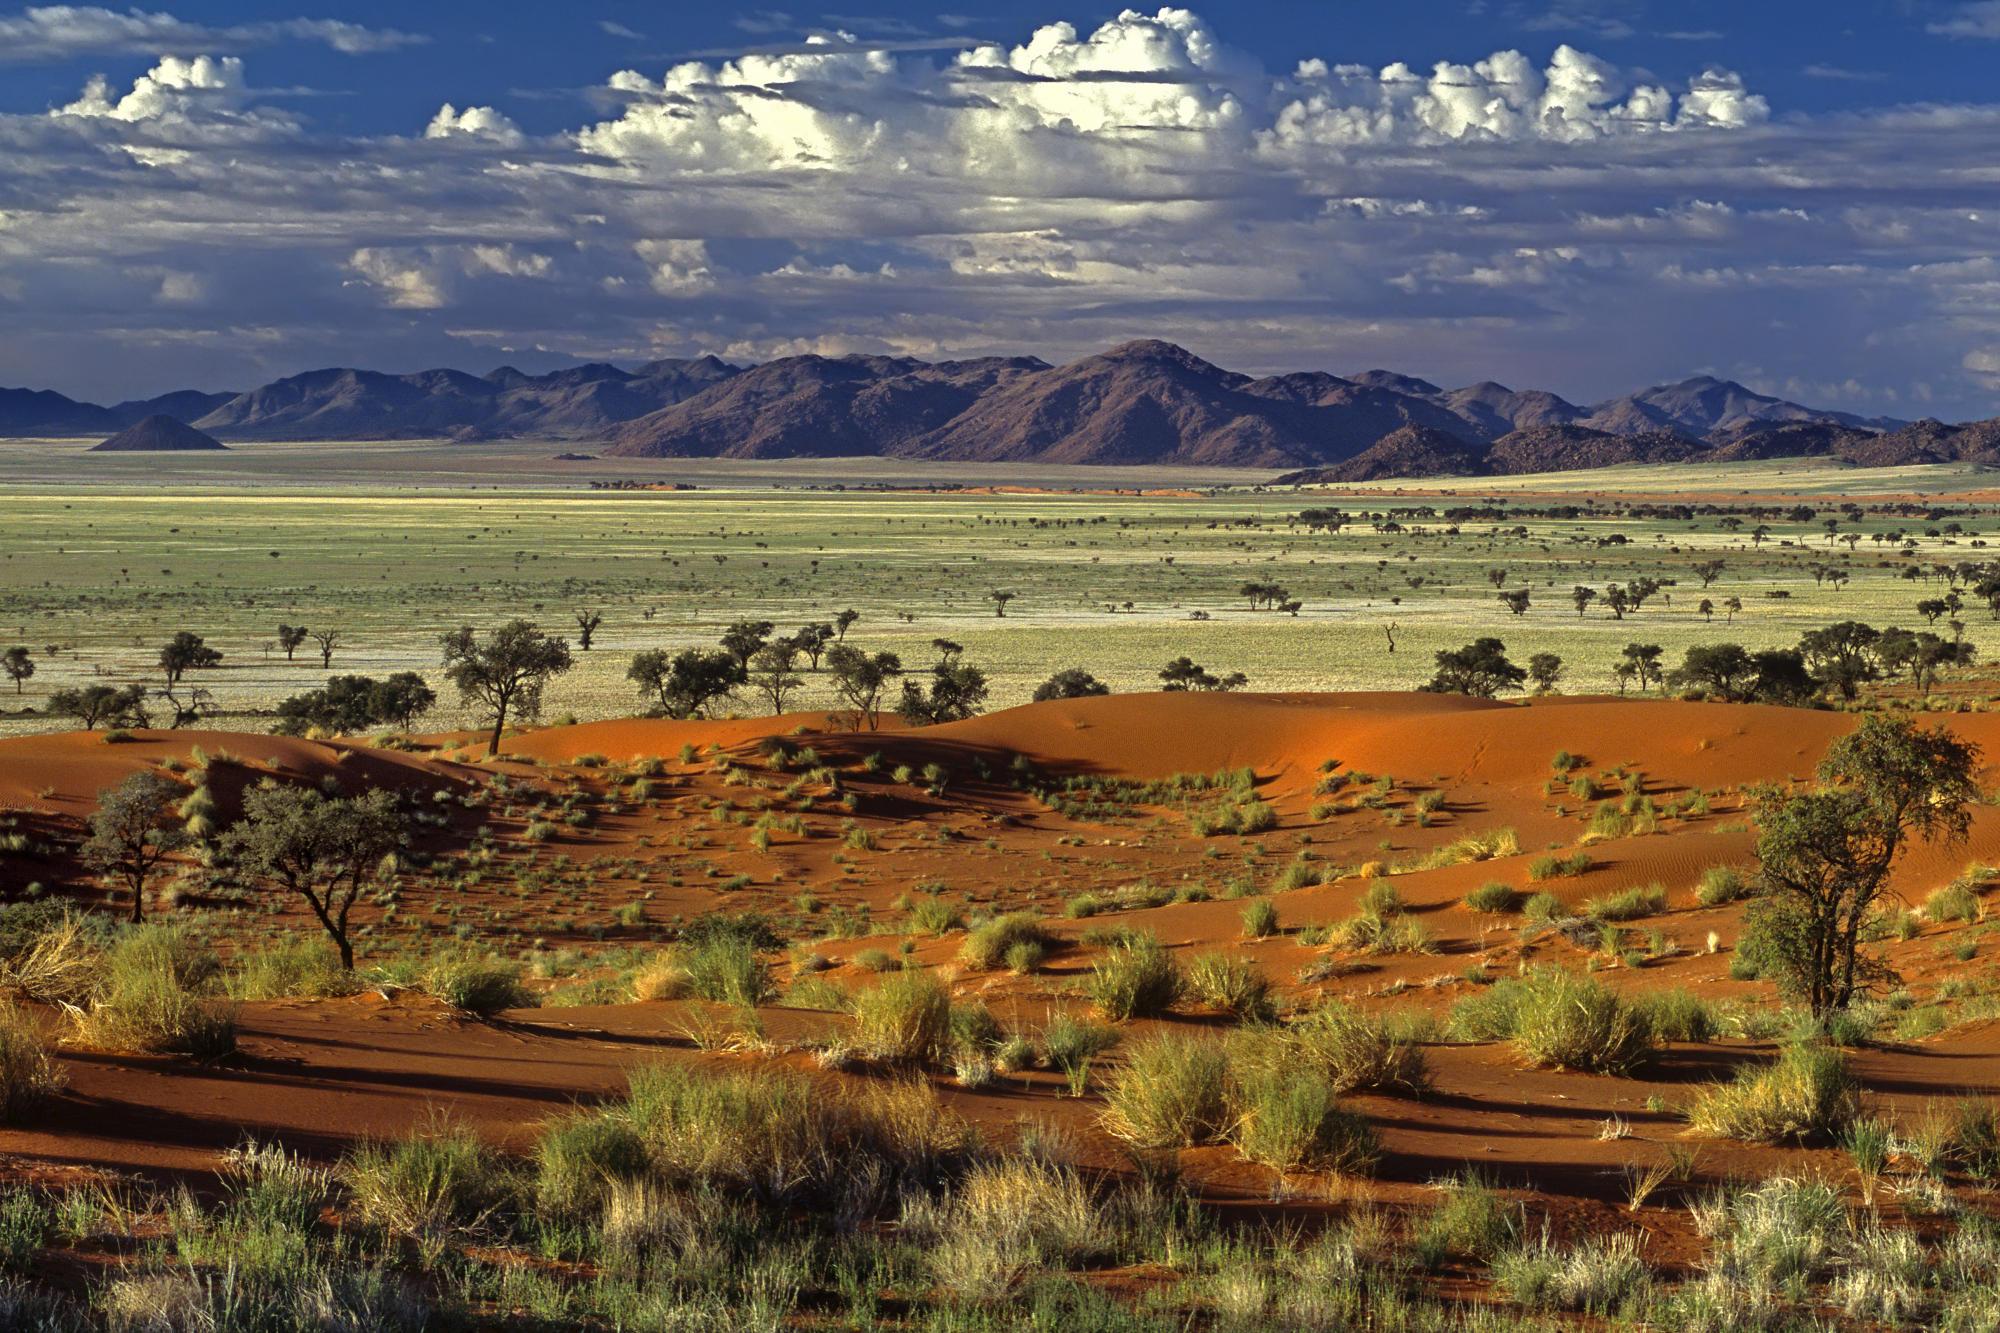 Tok Tokkie desert landscape - Namib Rand reserve - Namib desrt - Namibia - Africa